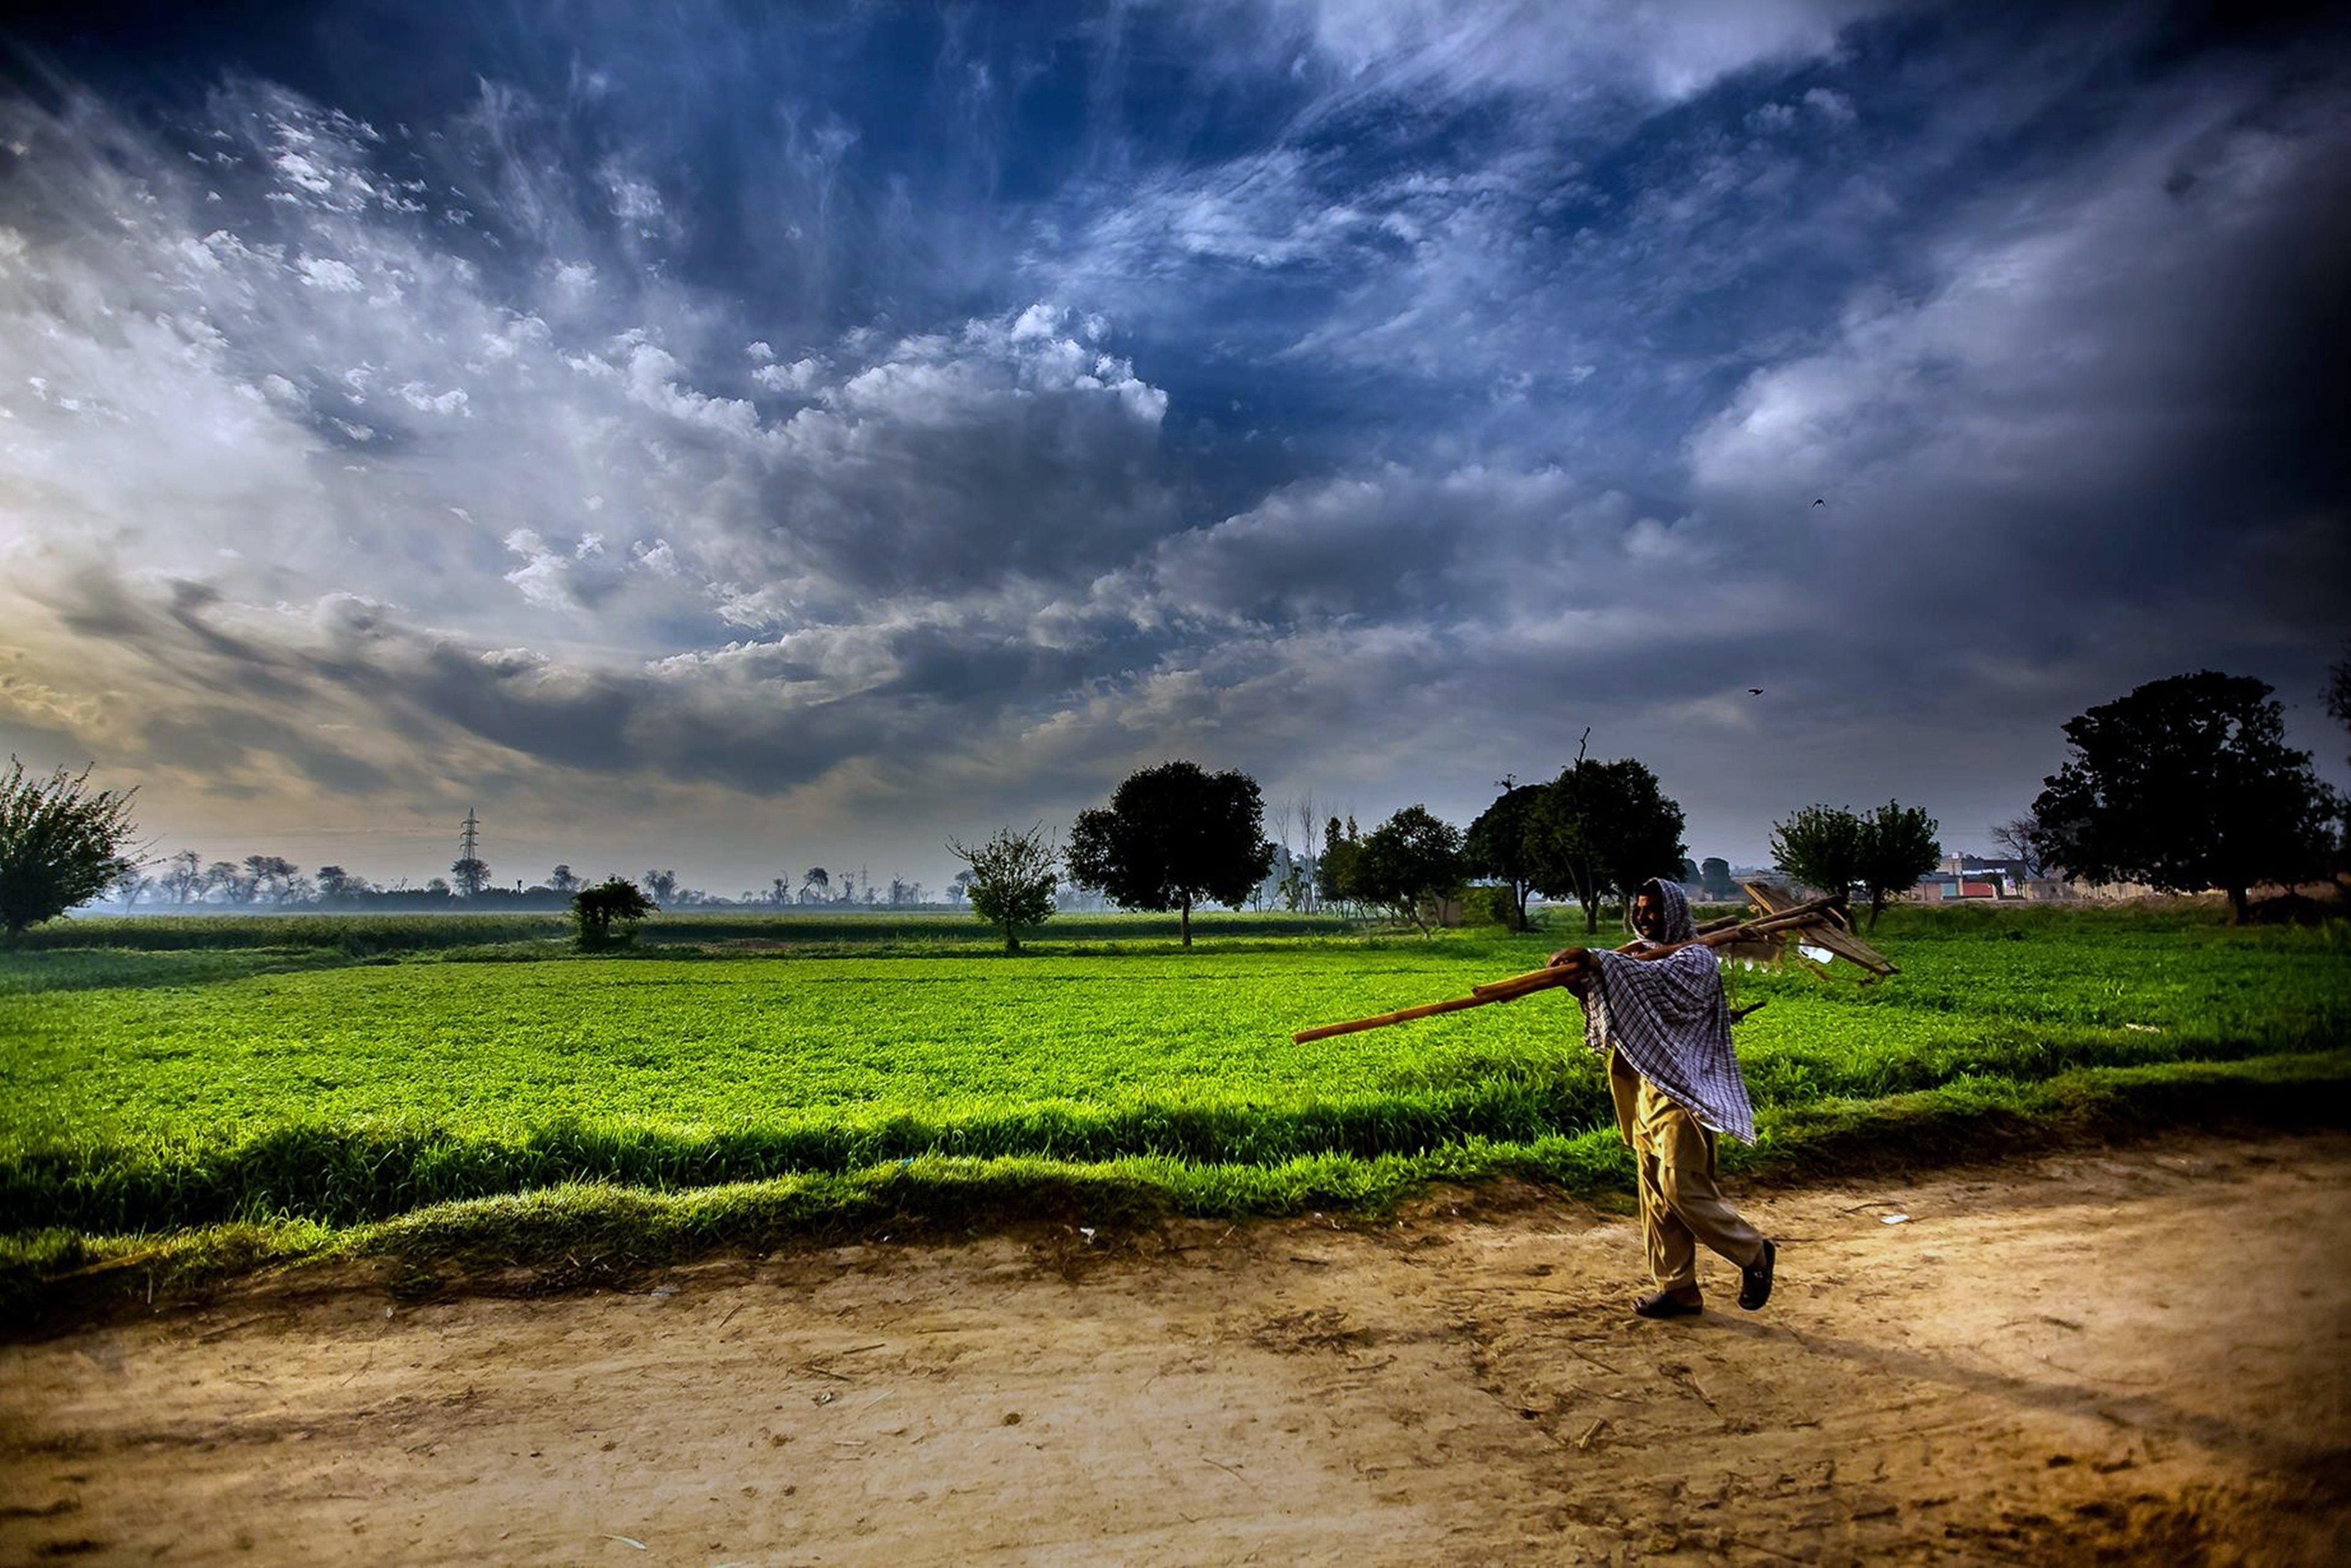 pakistan landscapes man farmer agriculture clouds sky